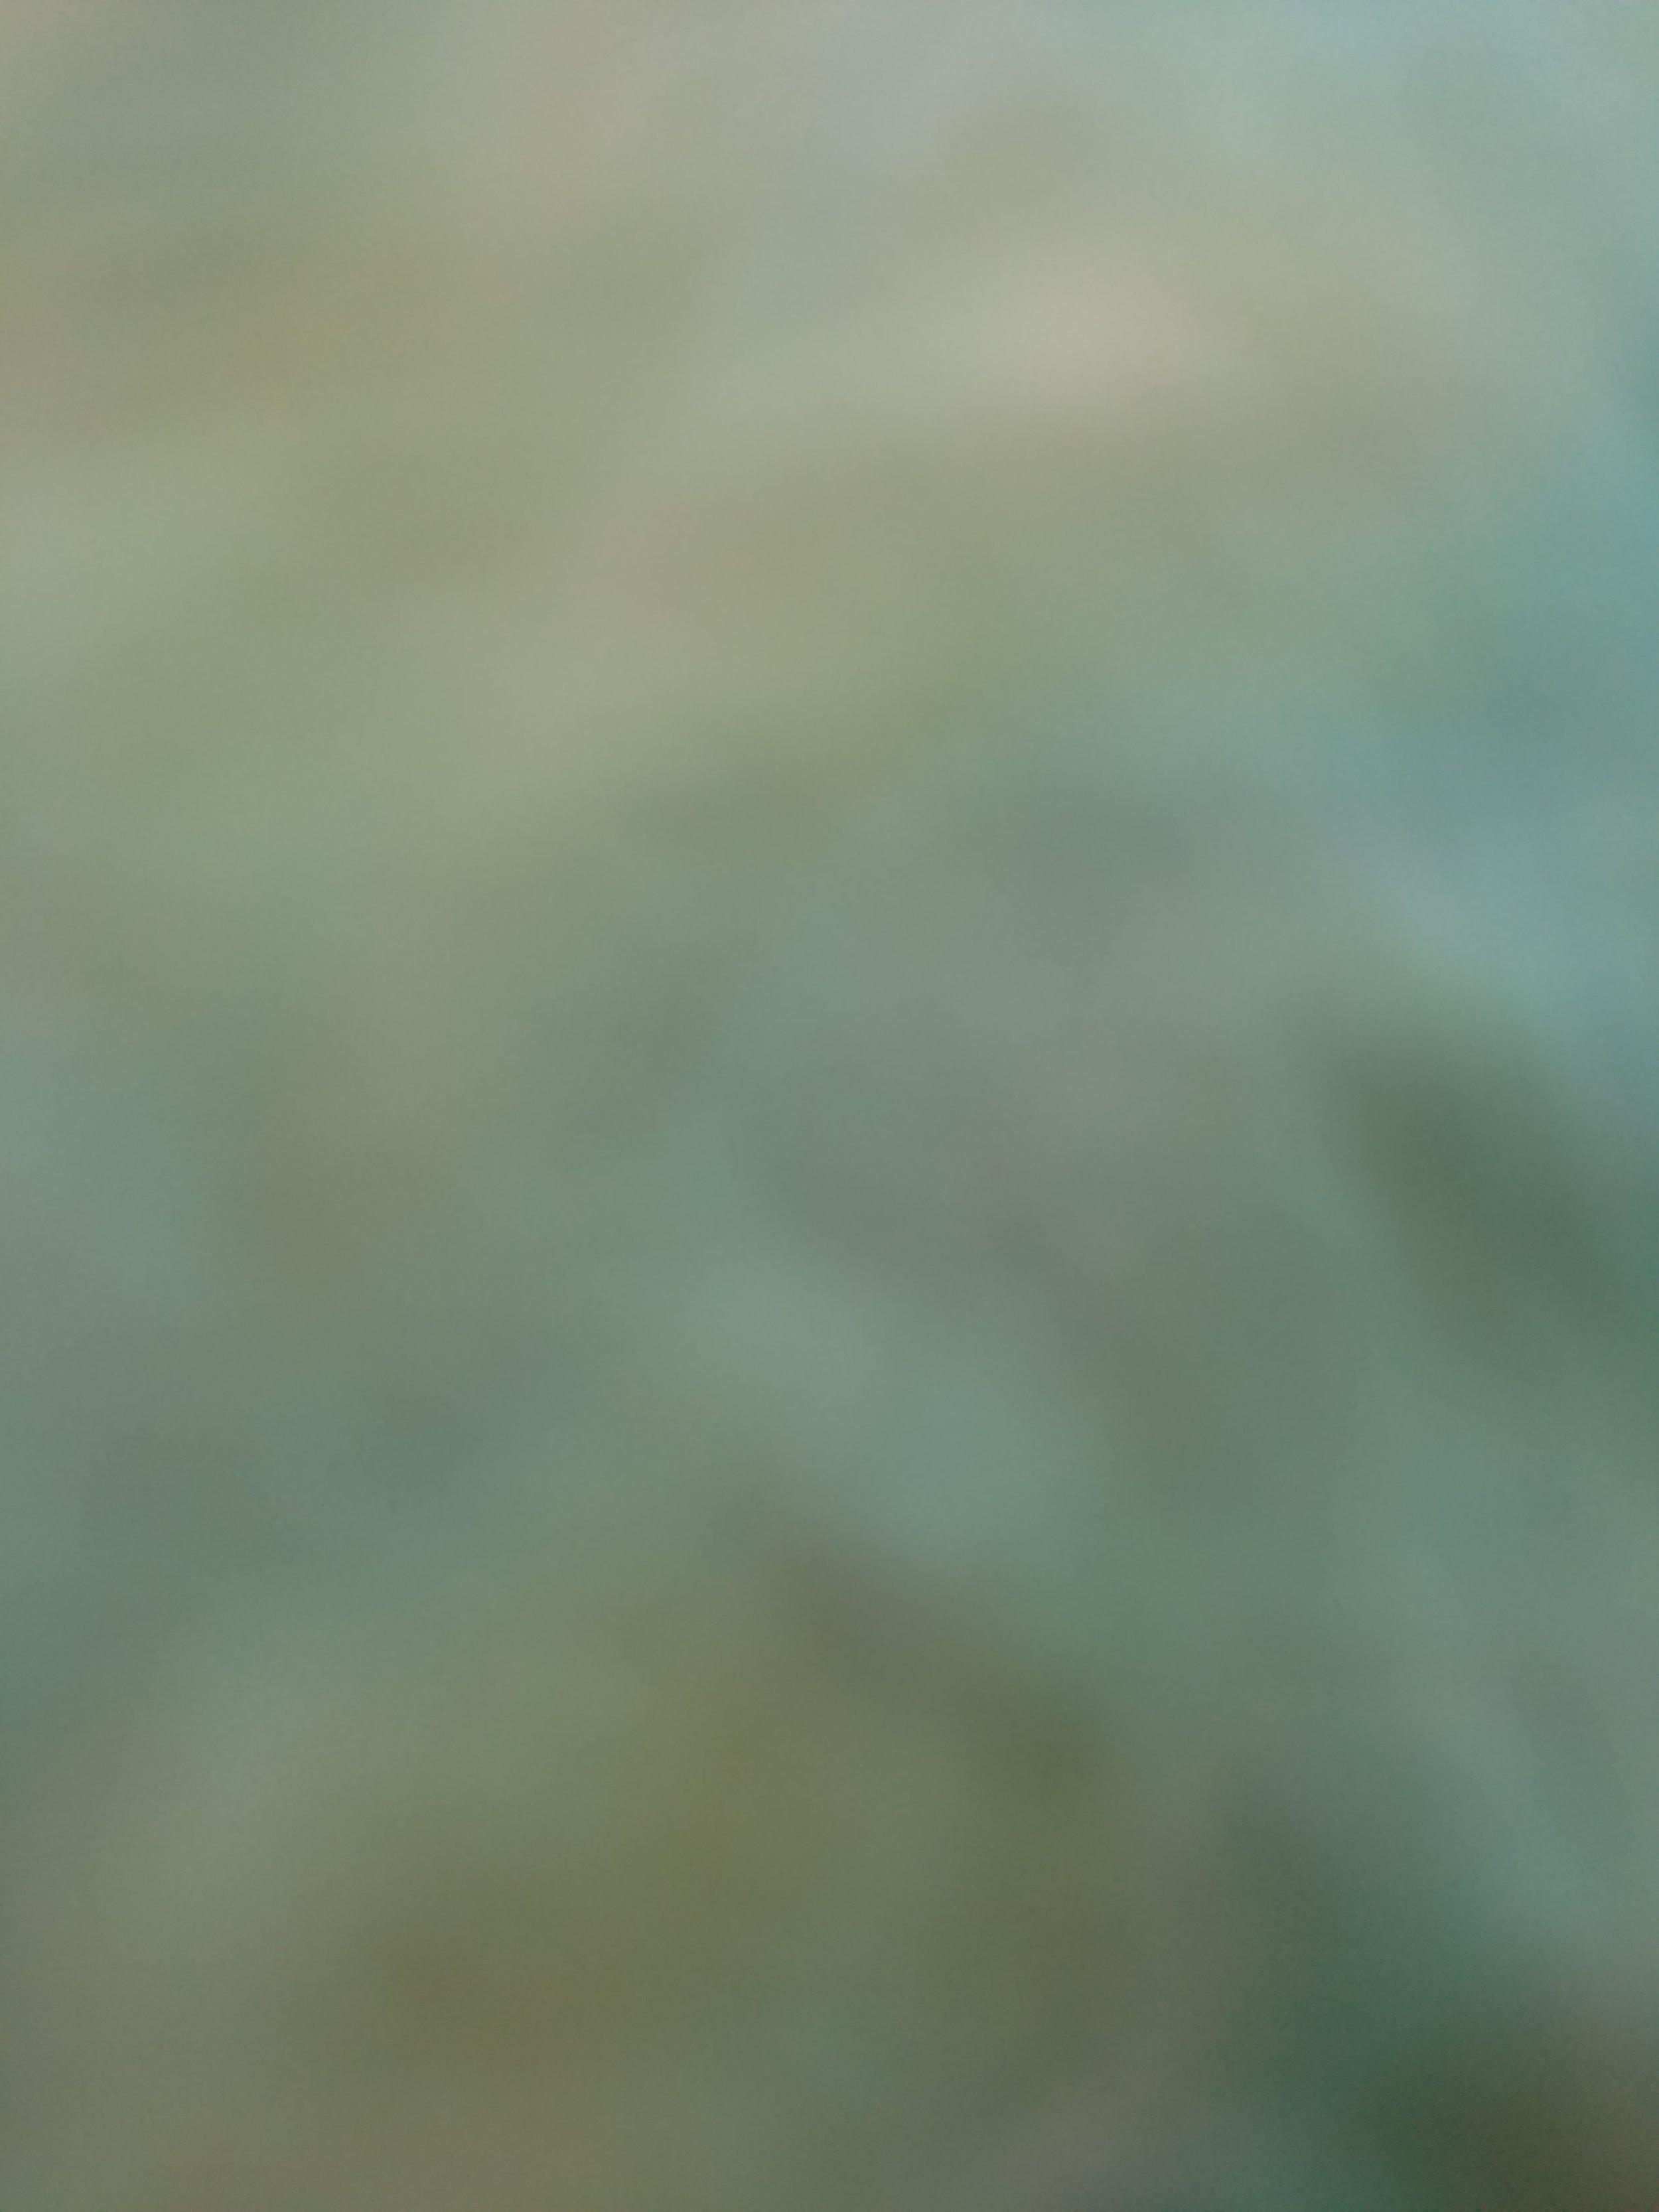 willroth-co-free-texture-gradient-048.jpg